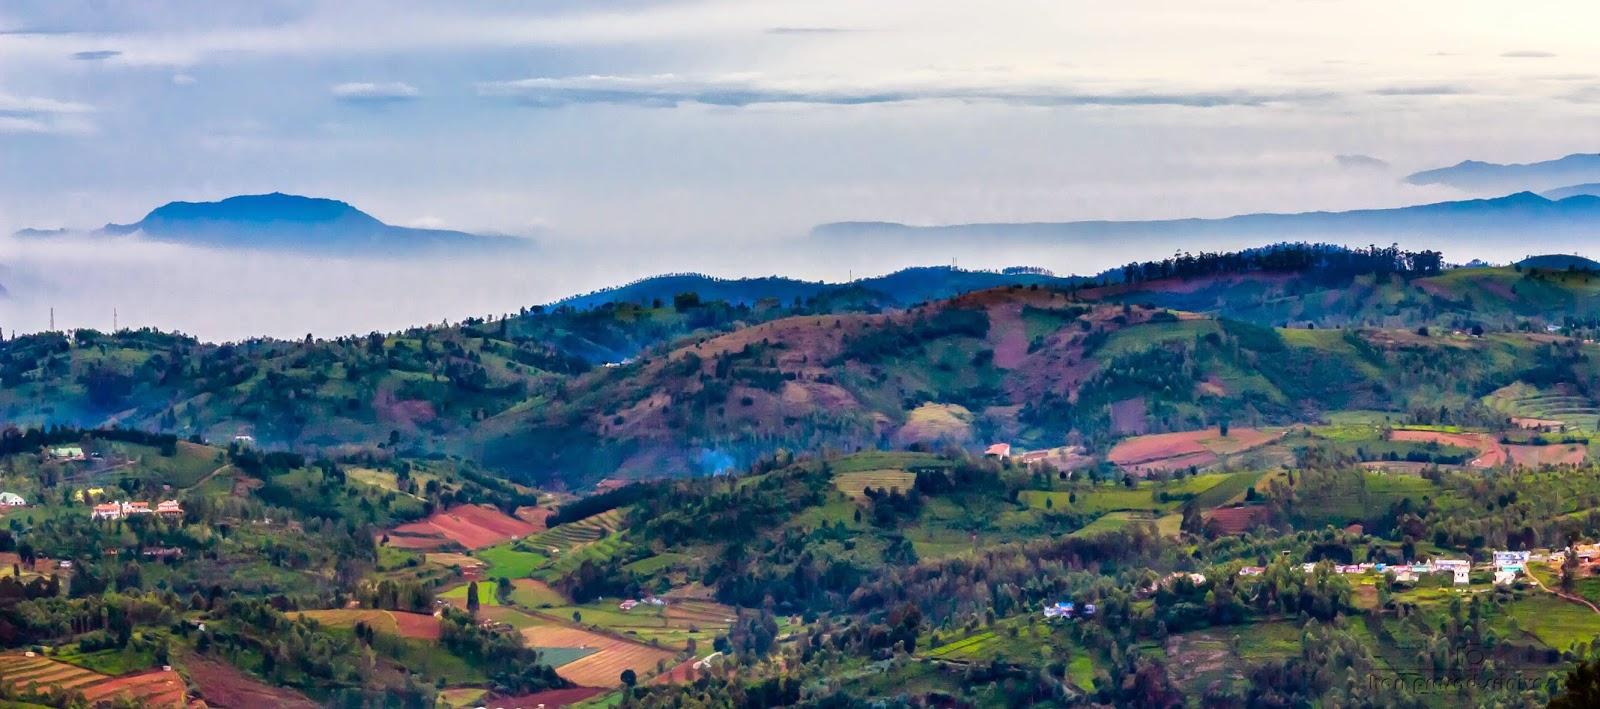 Ooty landscape photo